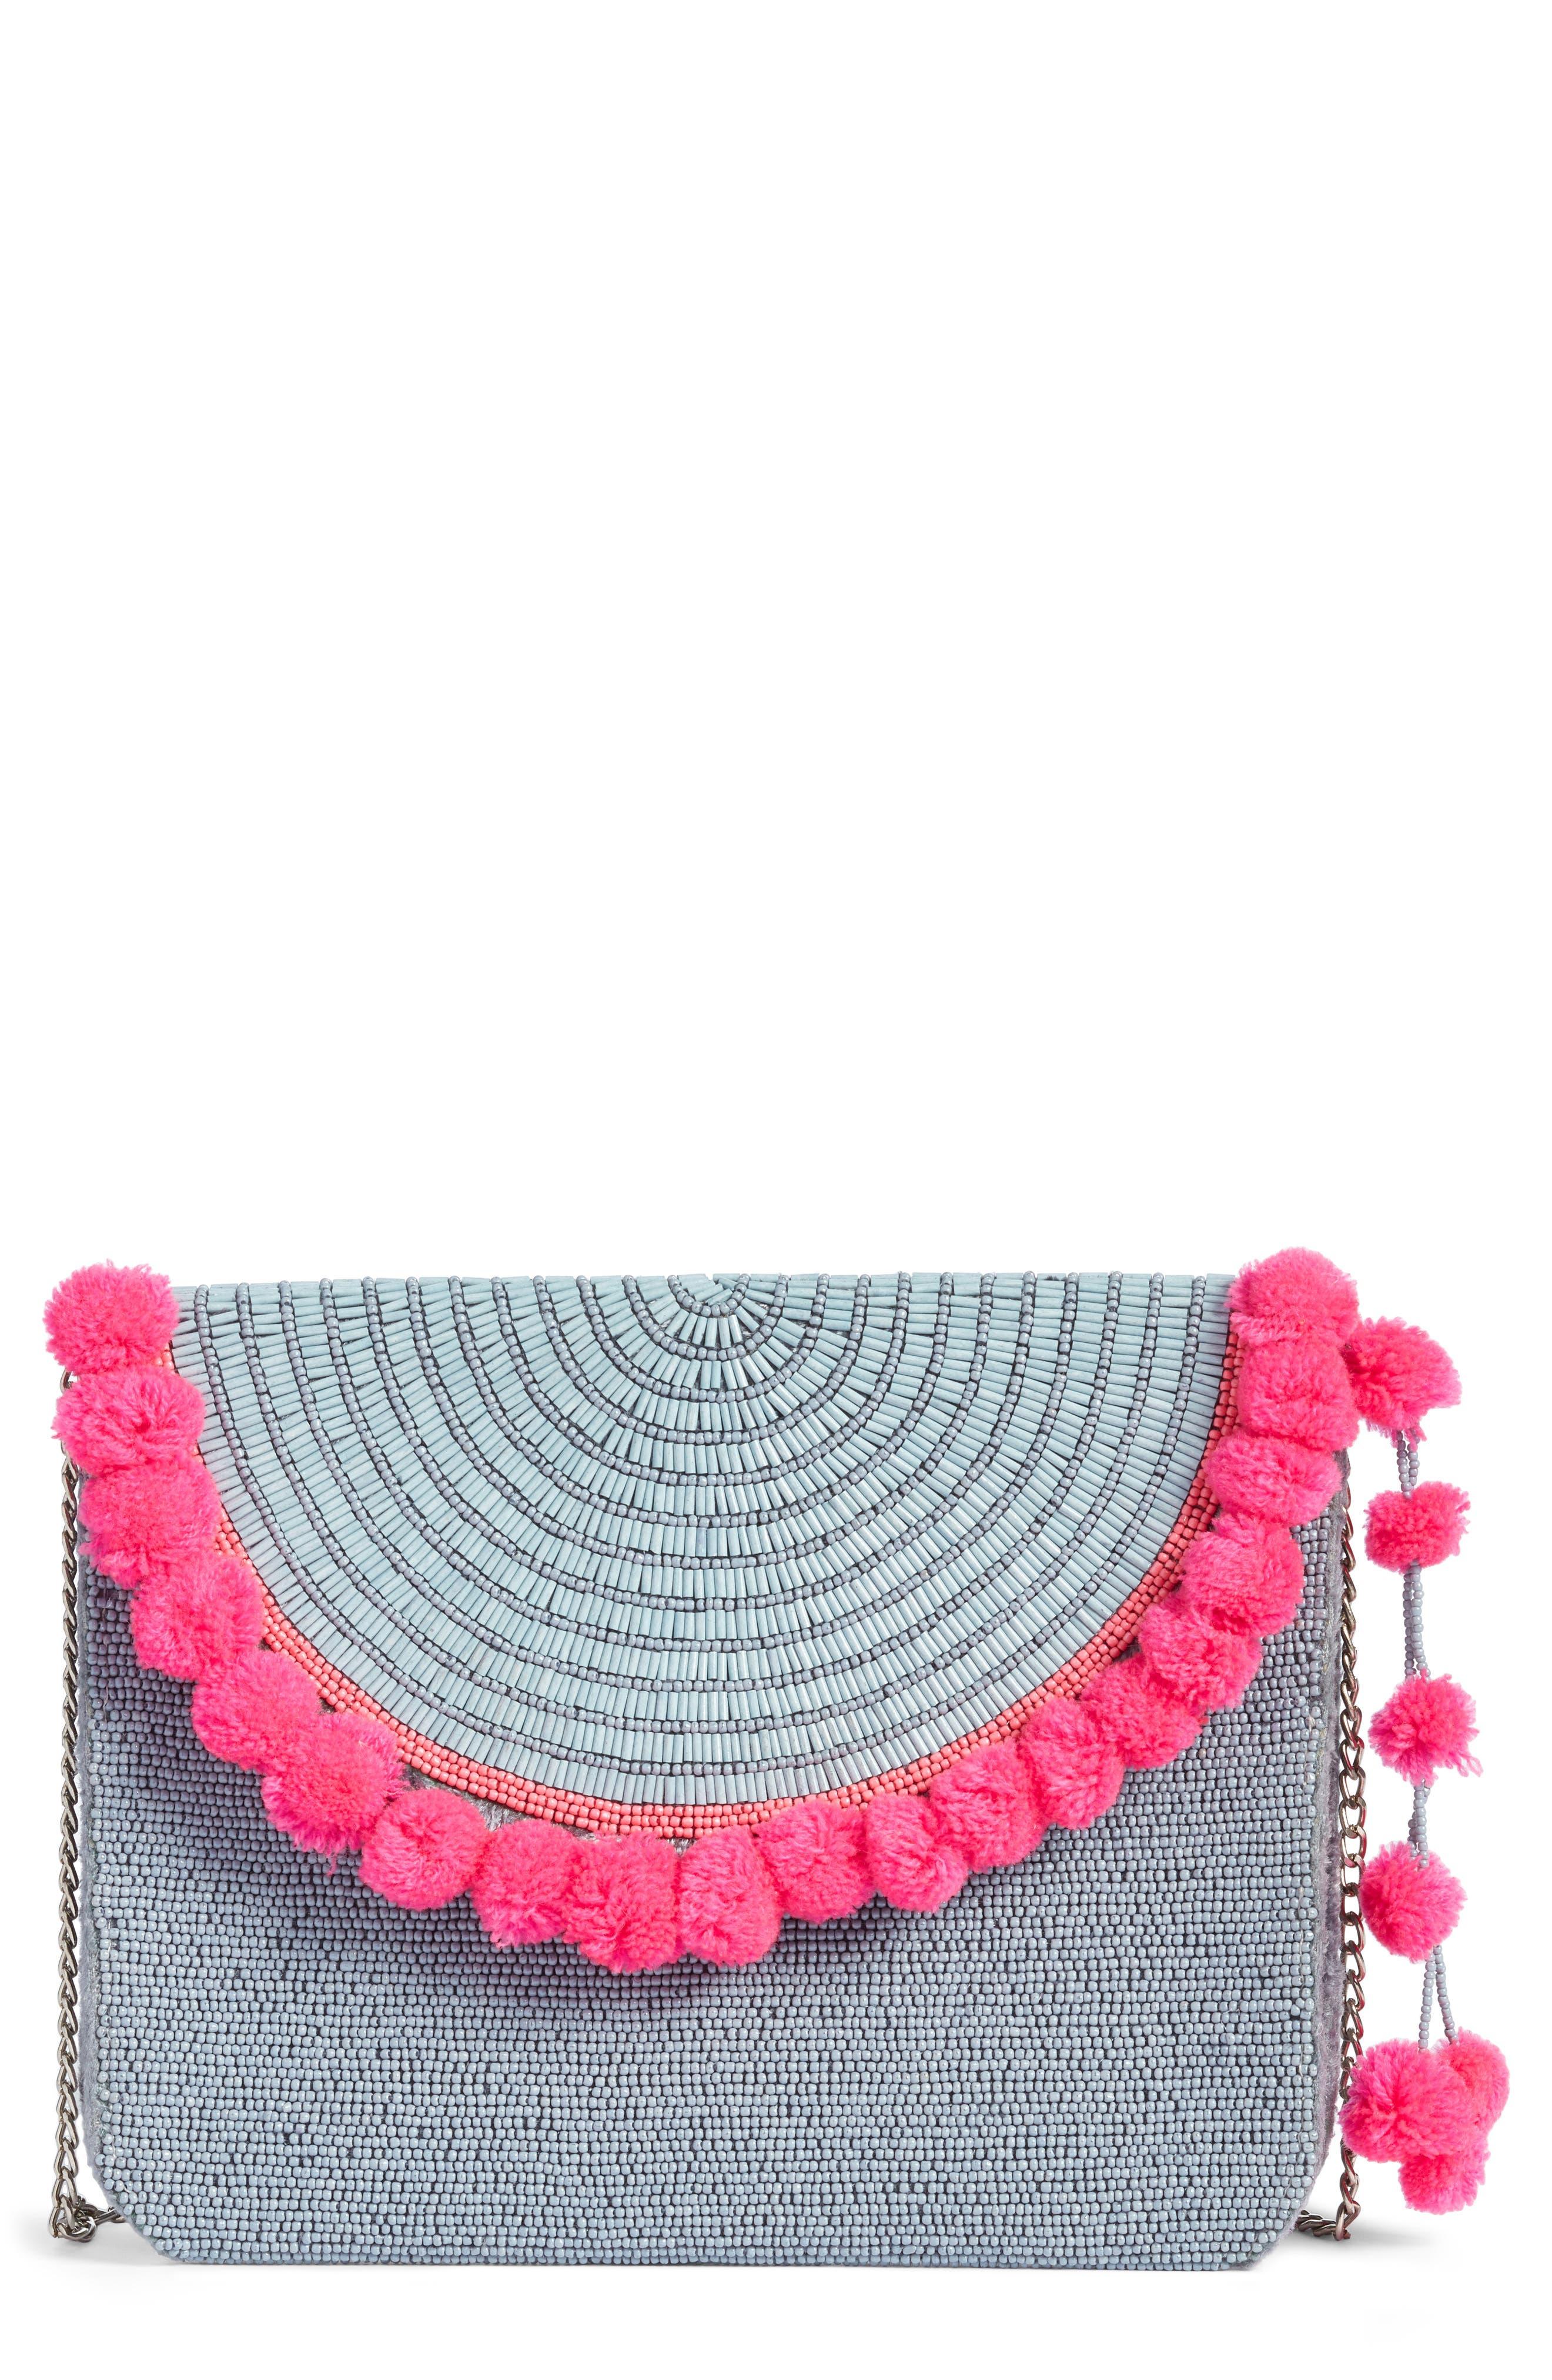 Mariah Beaded Clutch - Blue in Blue/ Pink